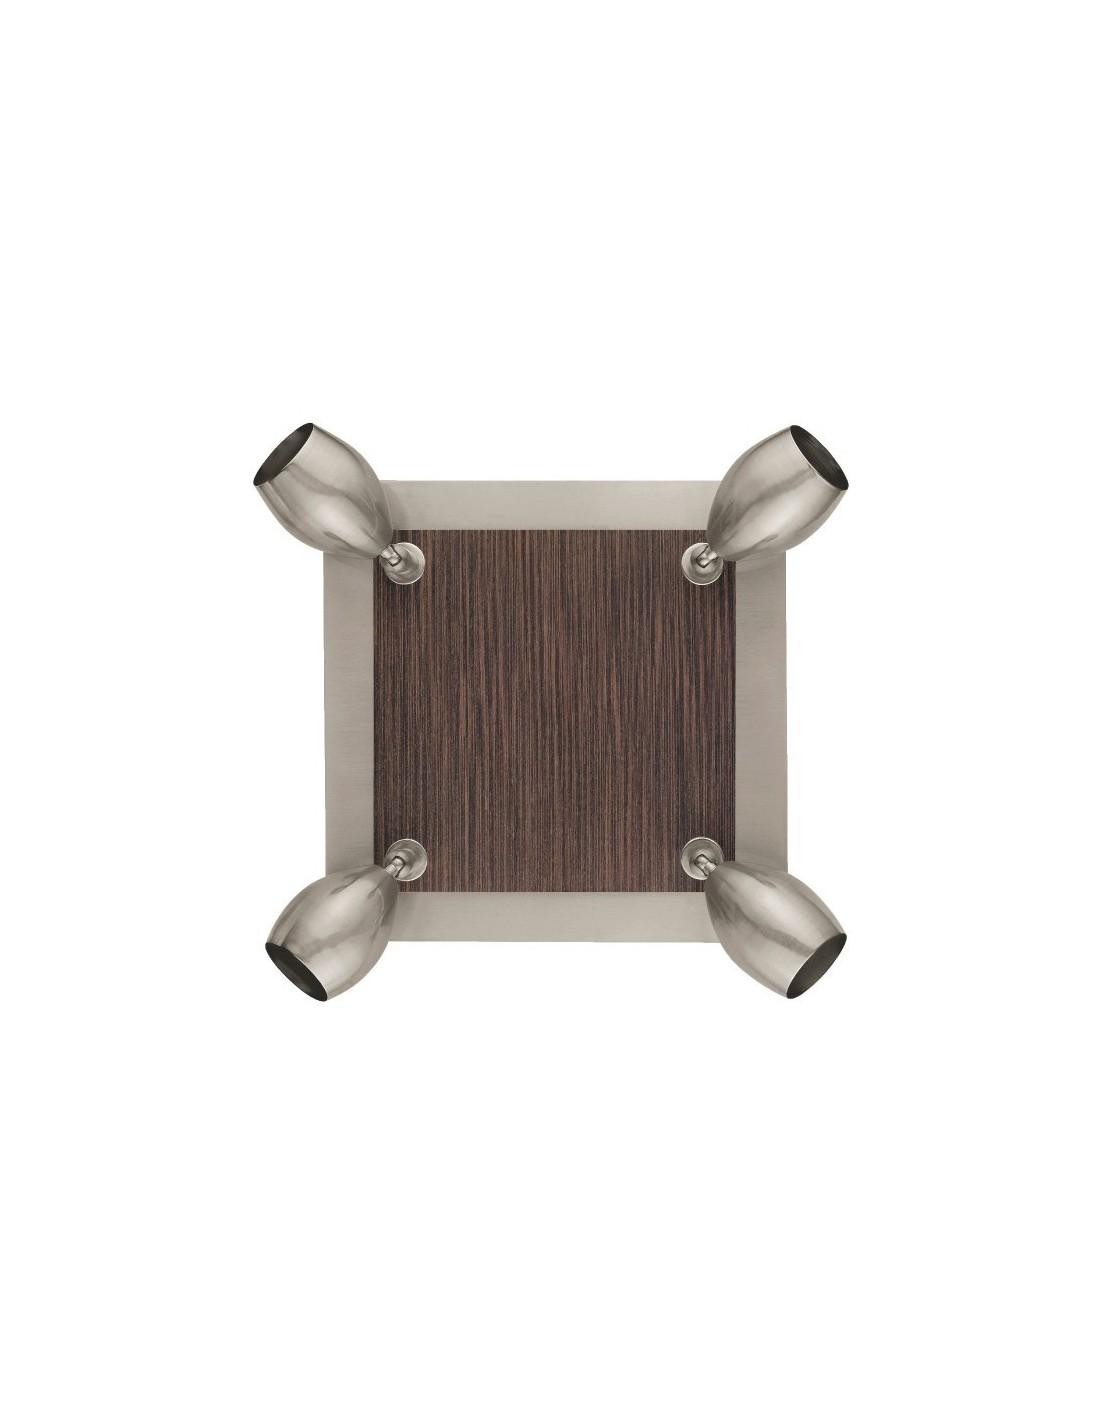 plafonnier 4 spots square. Black Bedroom Furniture Sets. Home Design Ideas